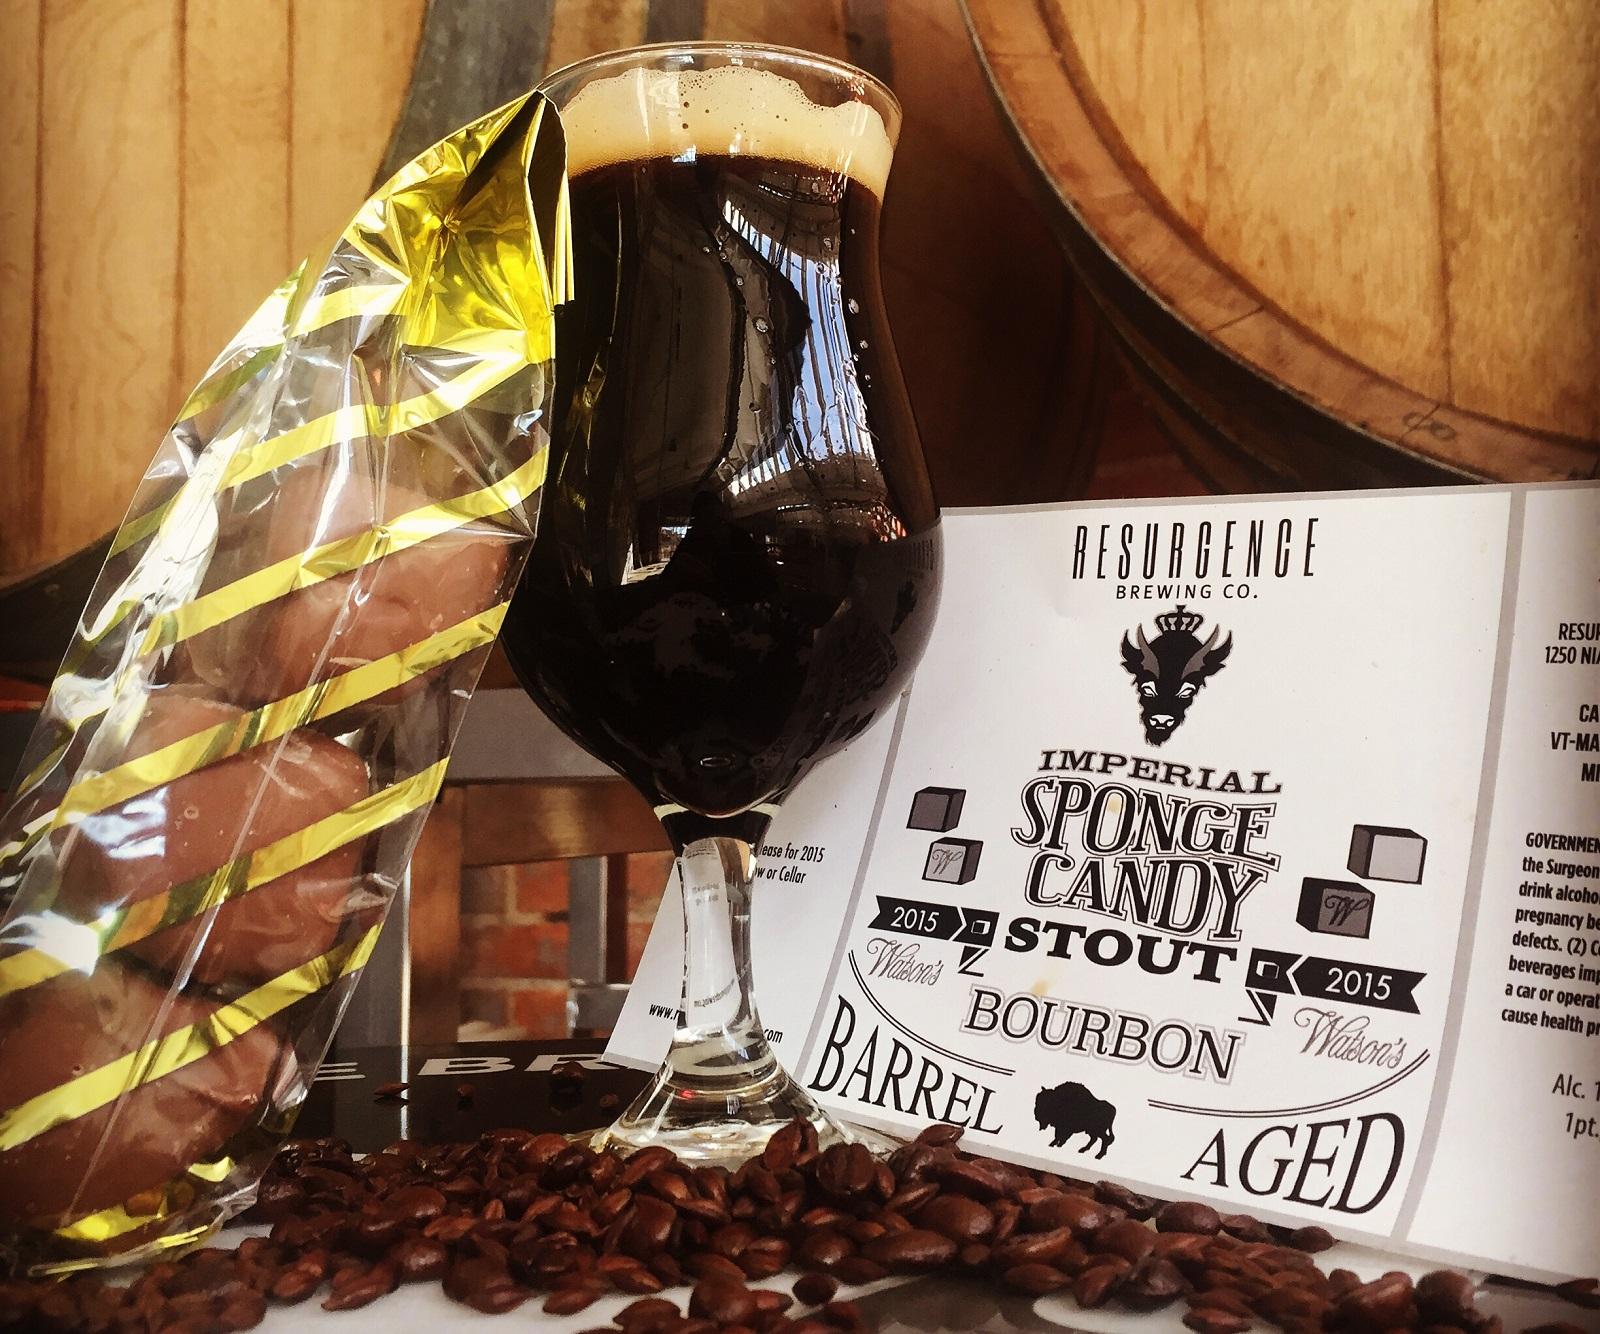 Beer news: NYBP, Old First Ward, Resurgence and more